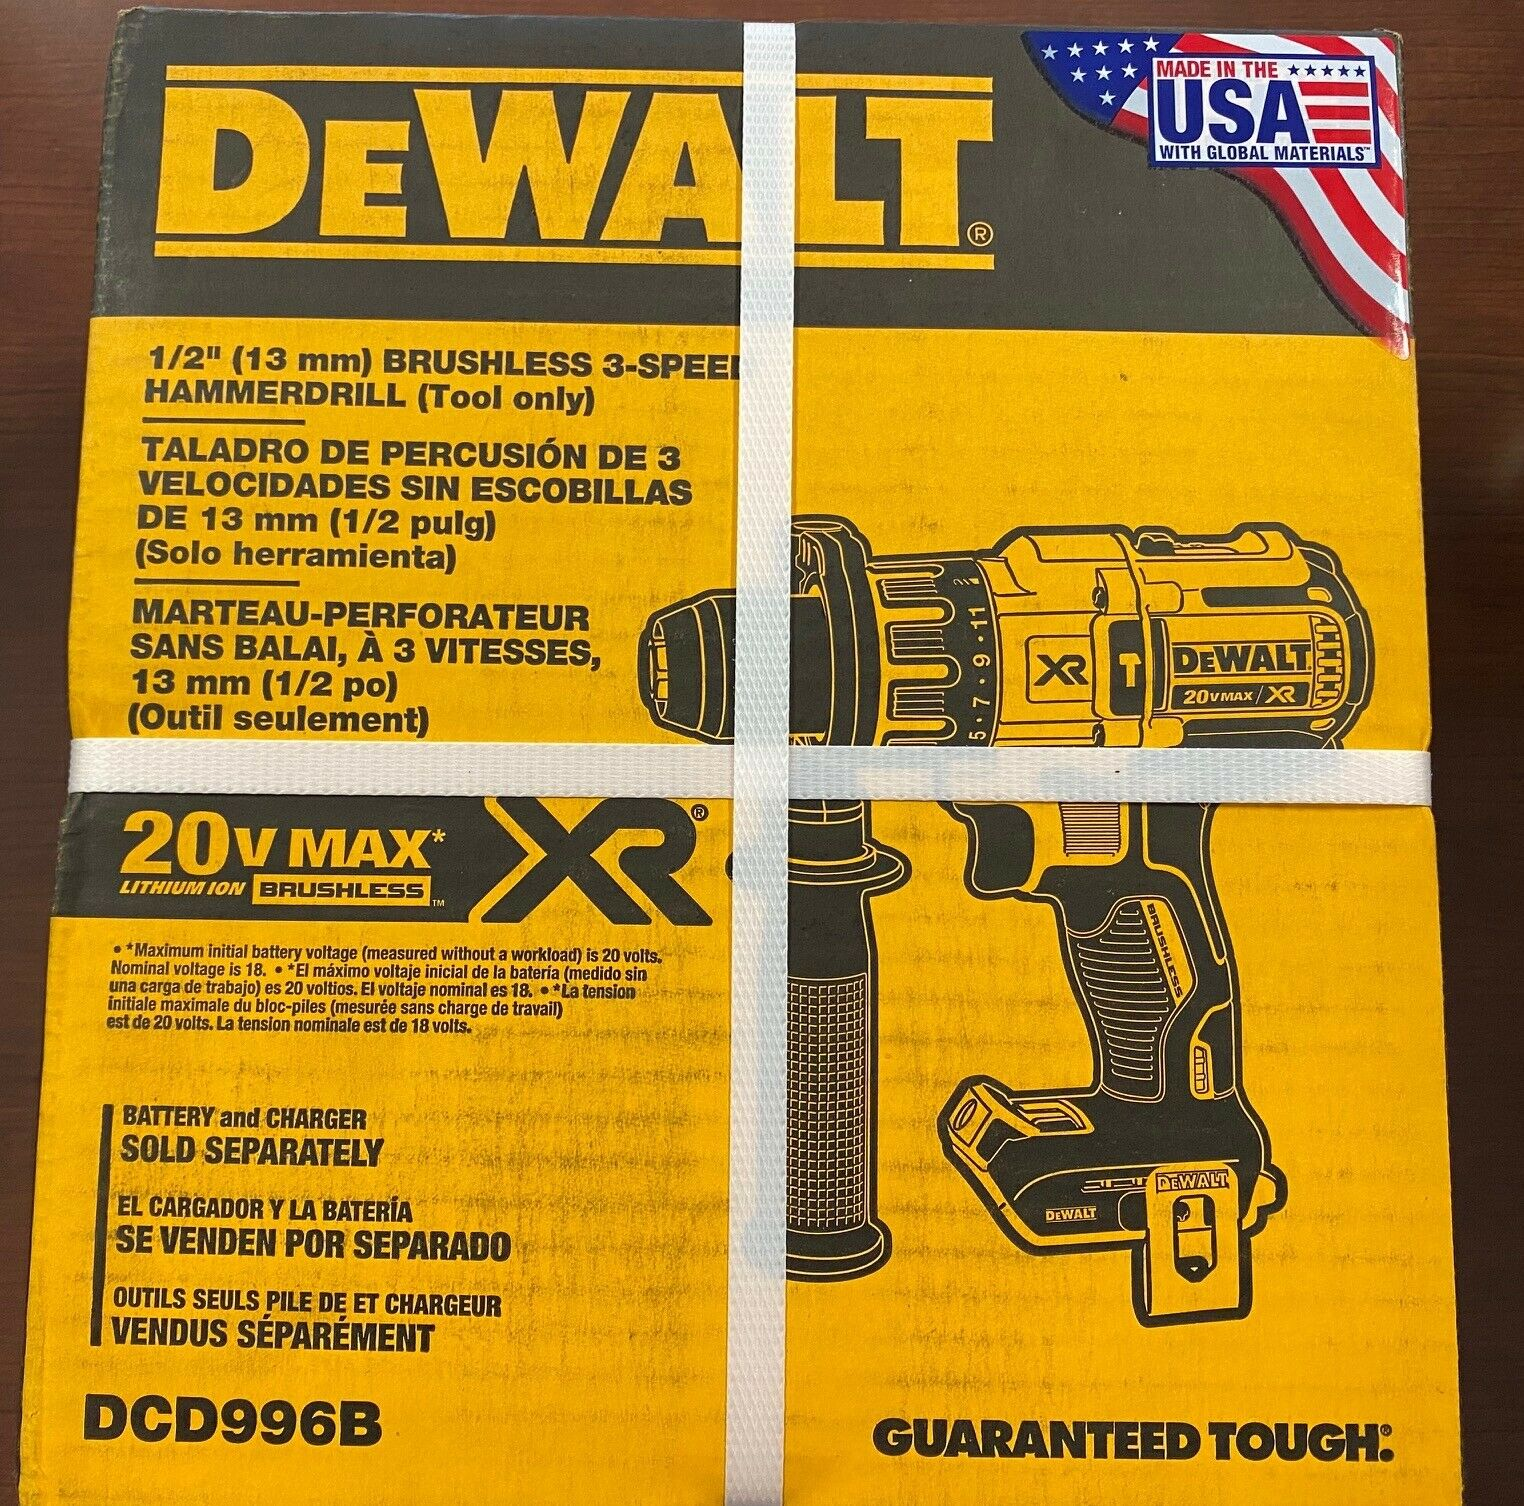 "BRAND NEW DEWALT DCD996B 20V Max XR Li-Ion 1/2"" Brushless 3-"